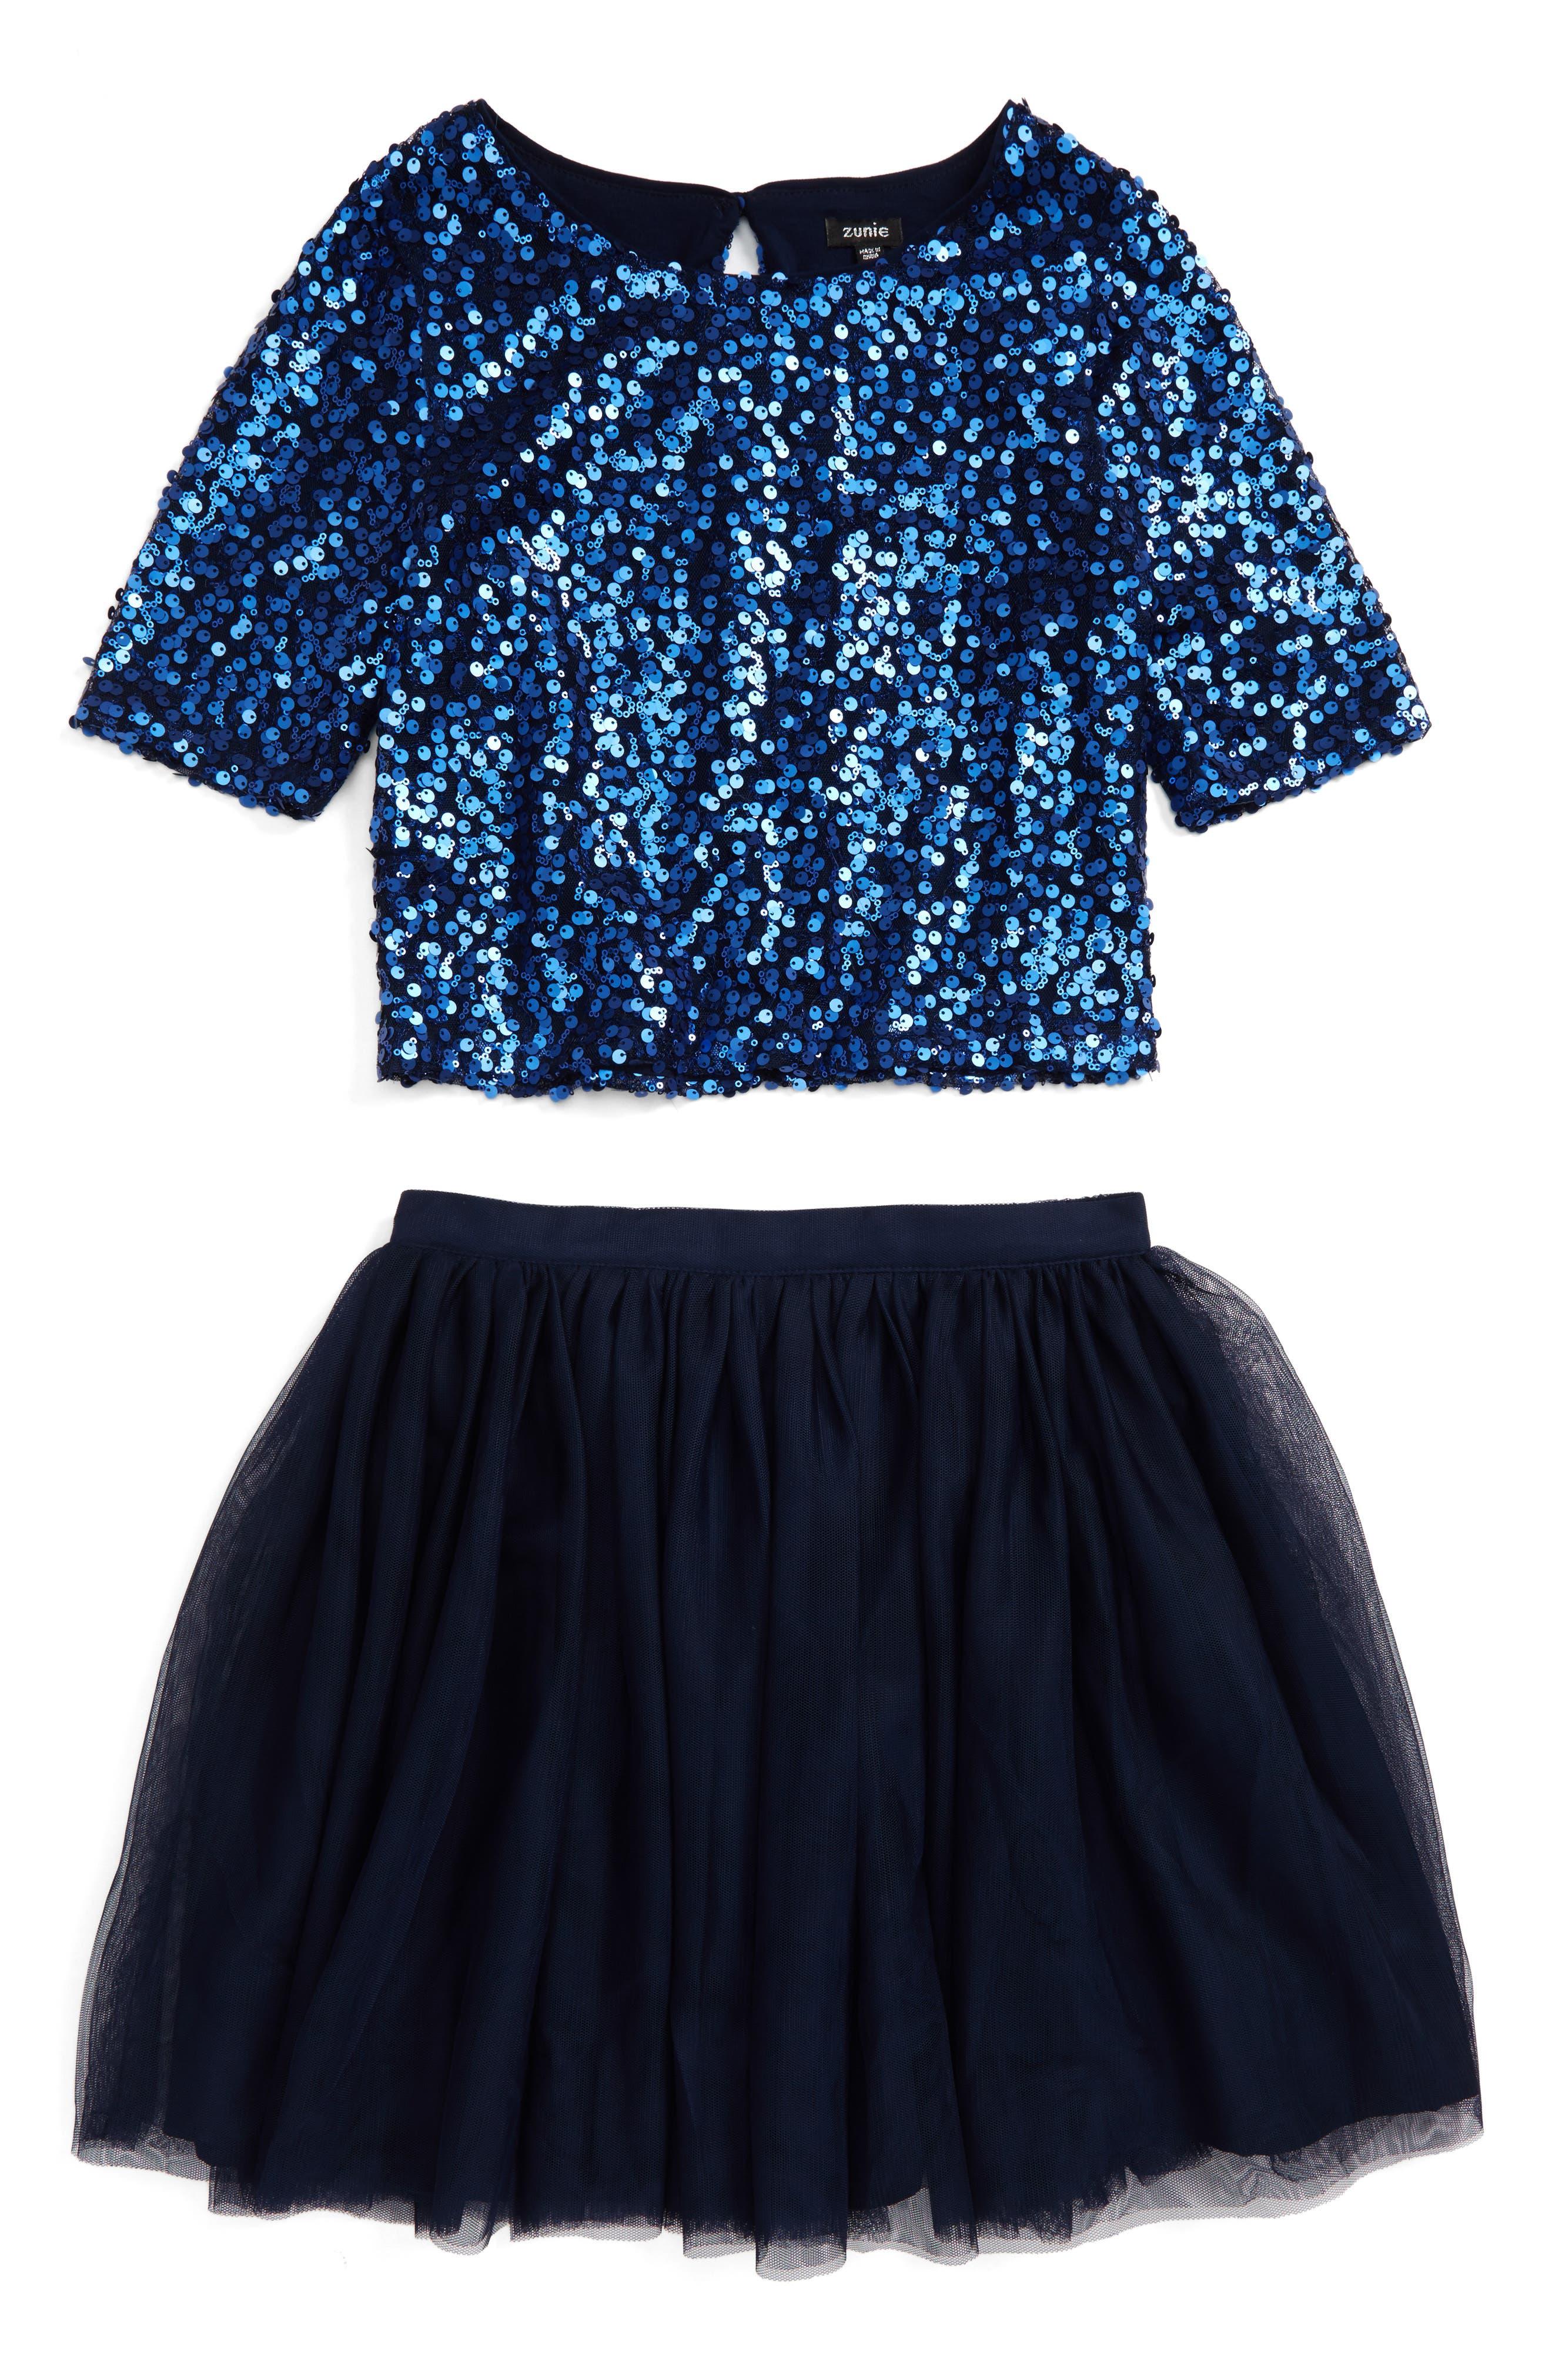 ZUNIE Sequin Top & Tulle Skirt Set